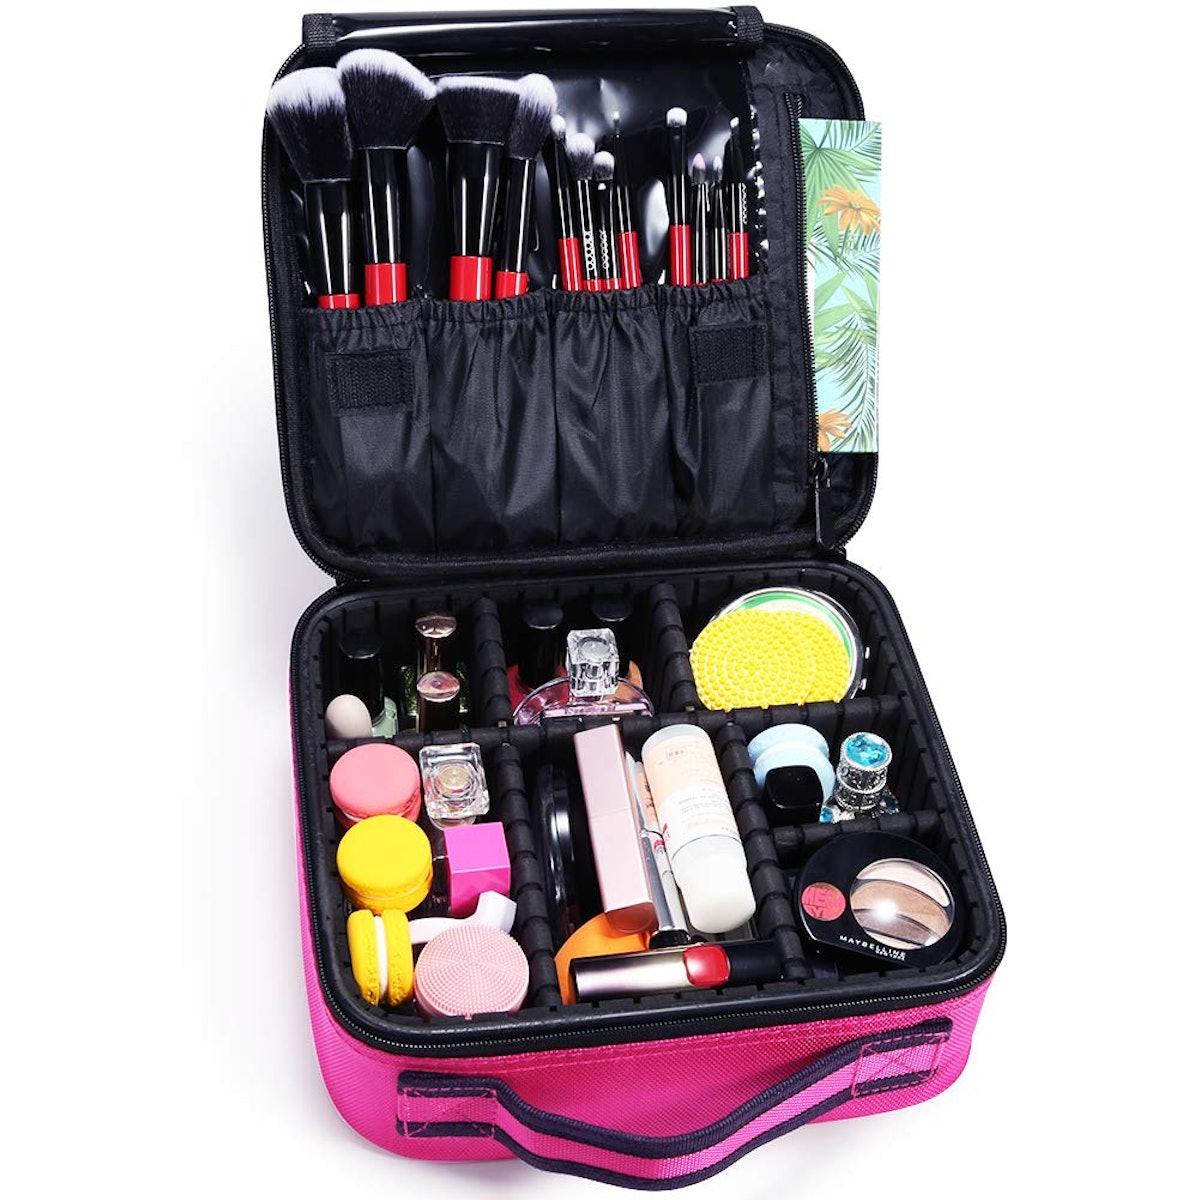 Docolor Travel Makeup Bag